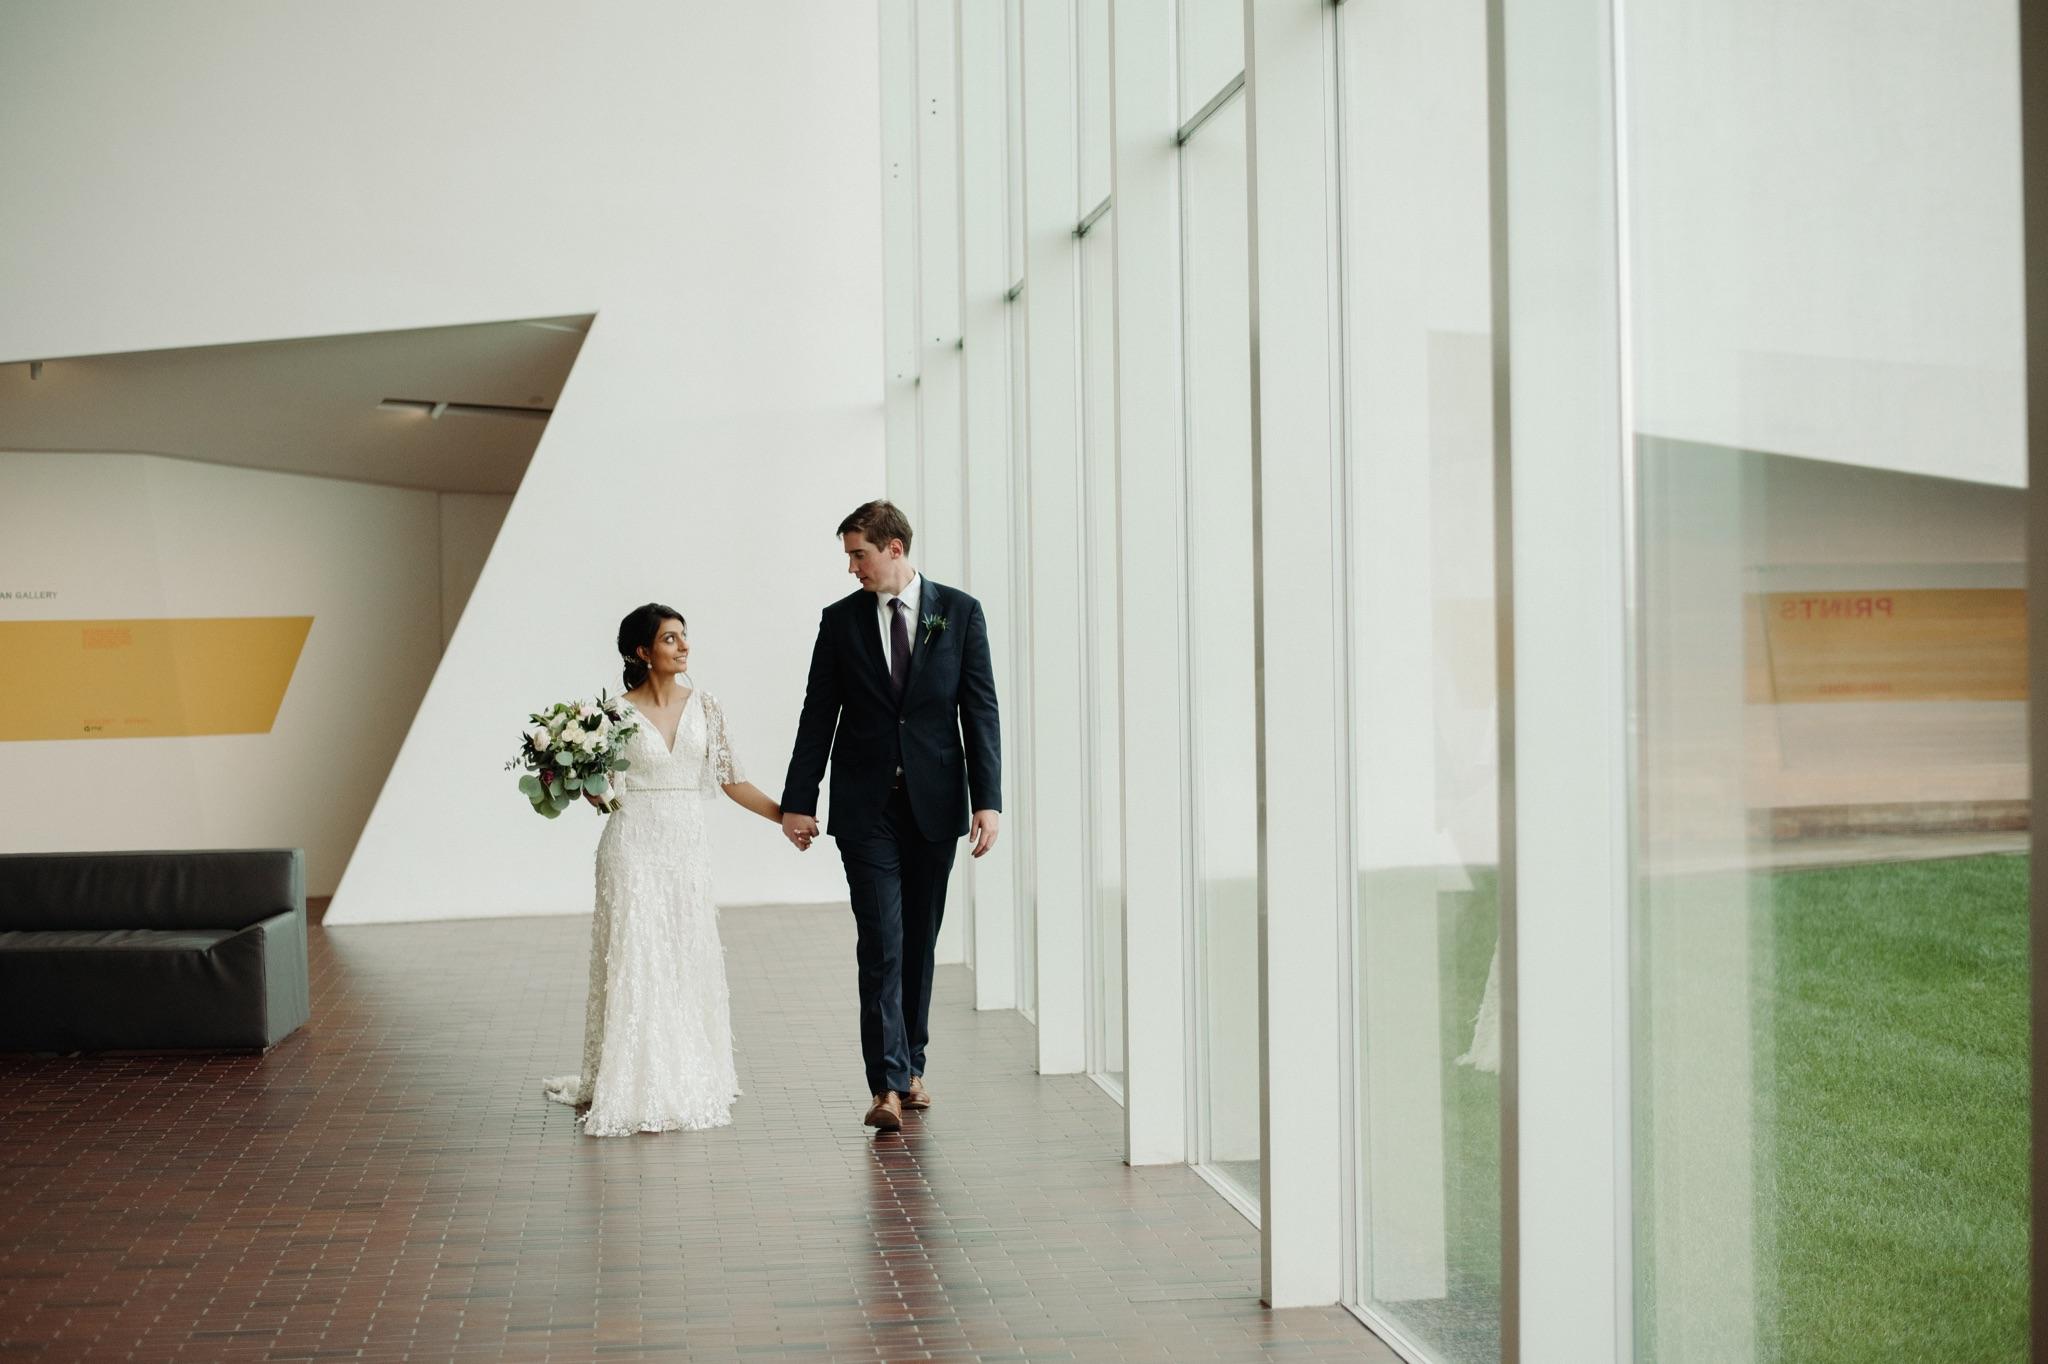 bride and groom walking, white background walker art center wedding